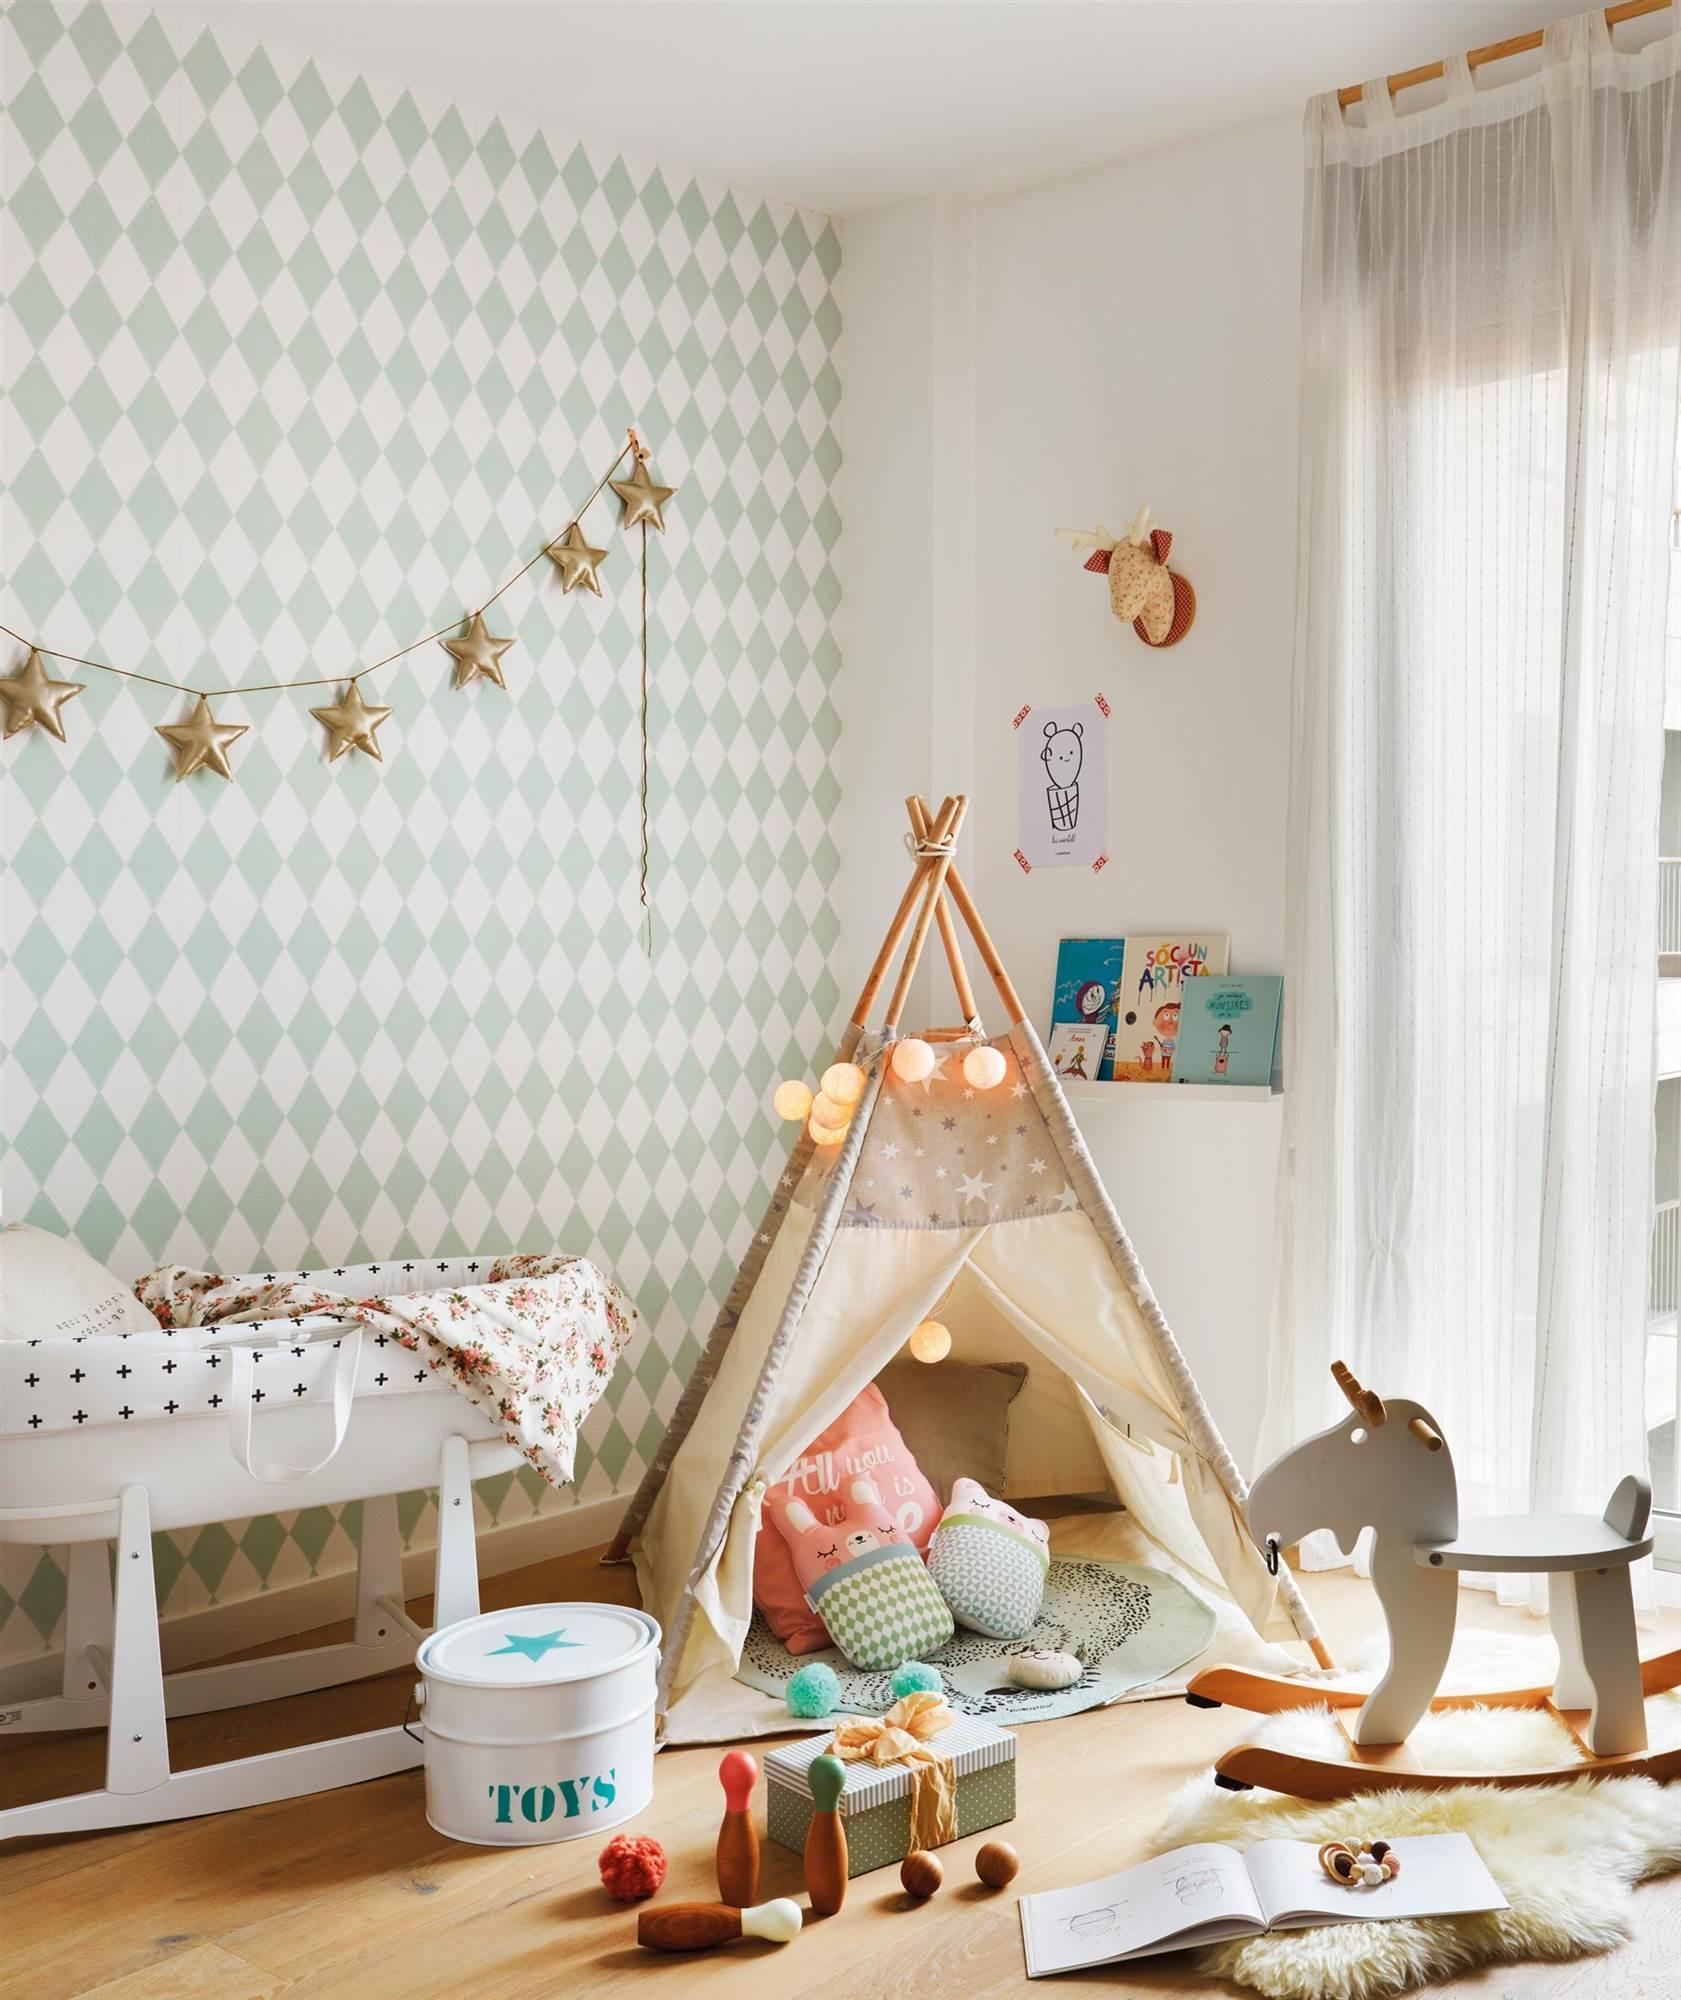 Papel Pintado C Mo Decorar Con Papel Pintado Para Paredes Elmueble ~ Habitaciones Juveniles Con Papel Pintado